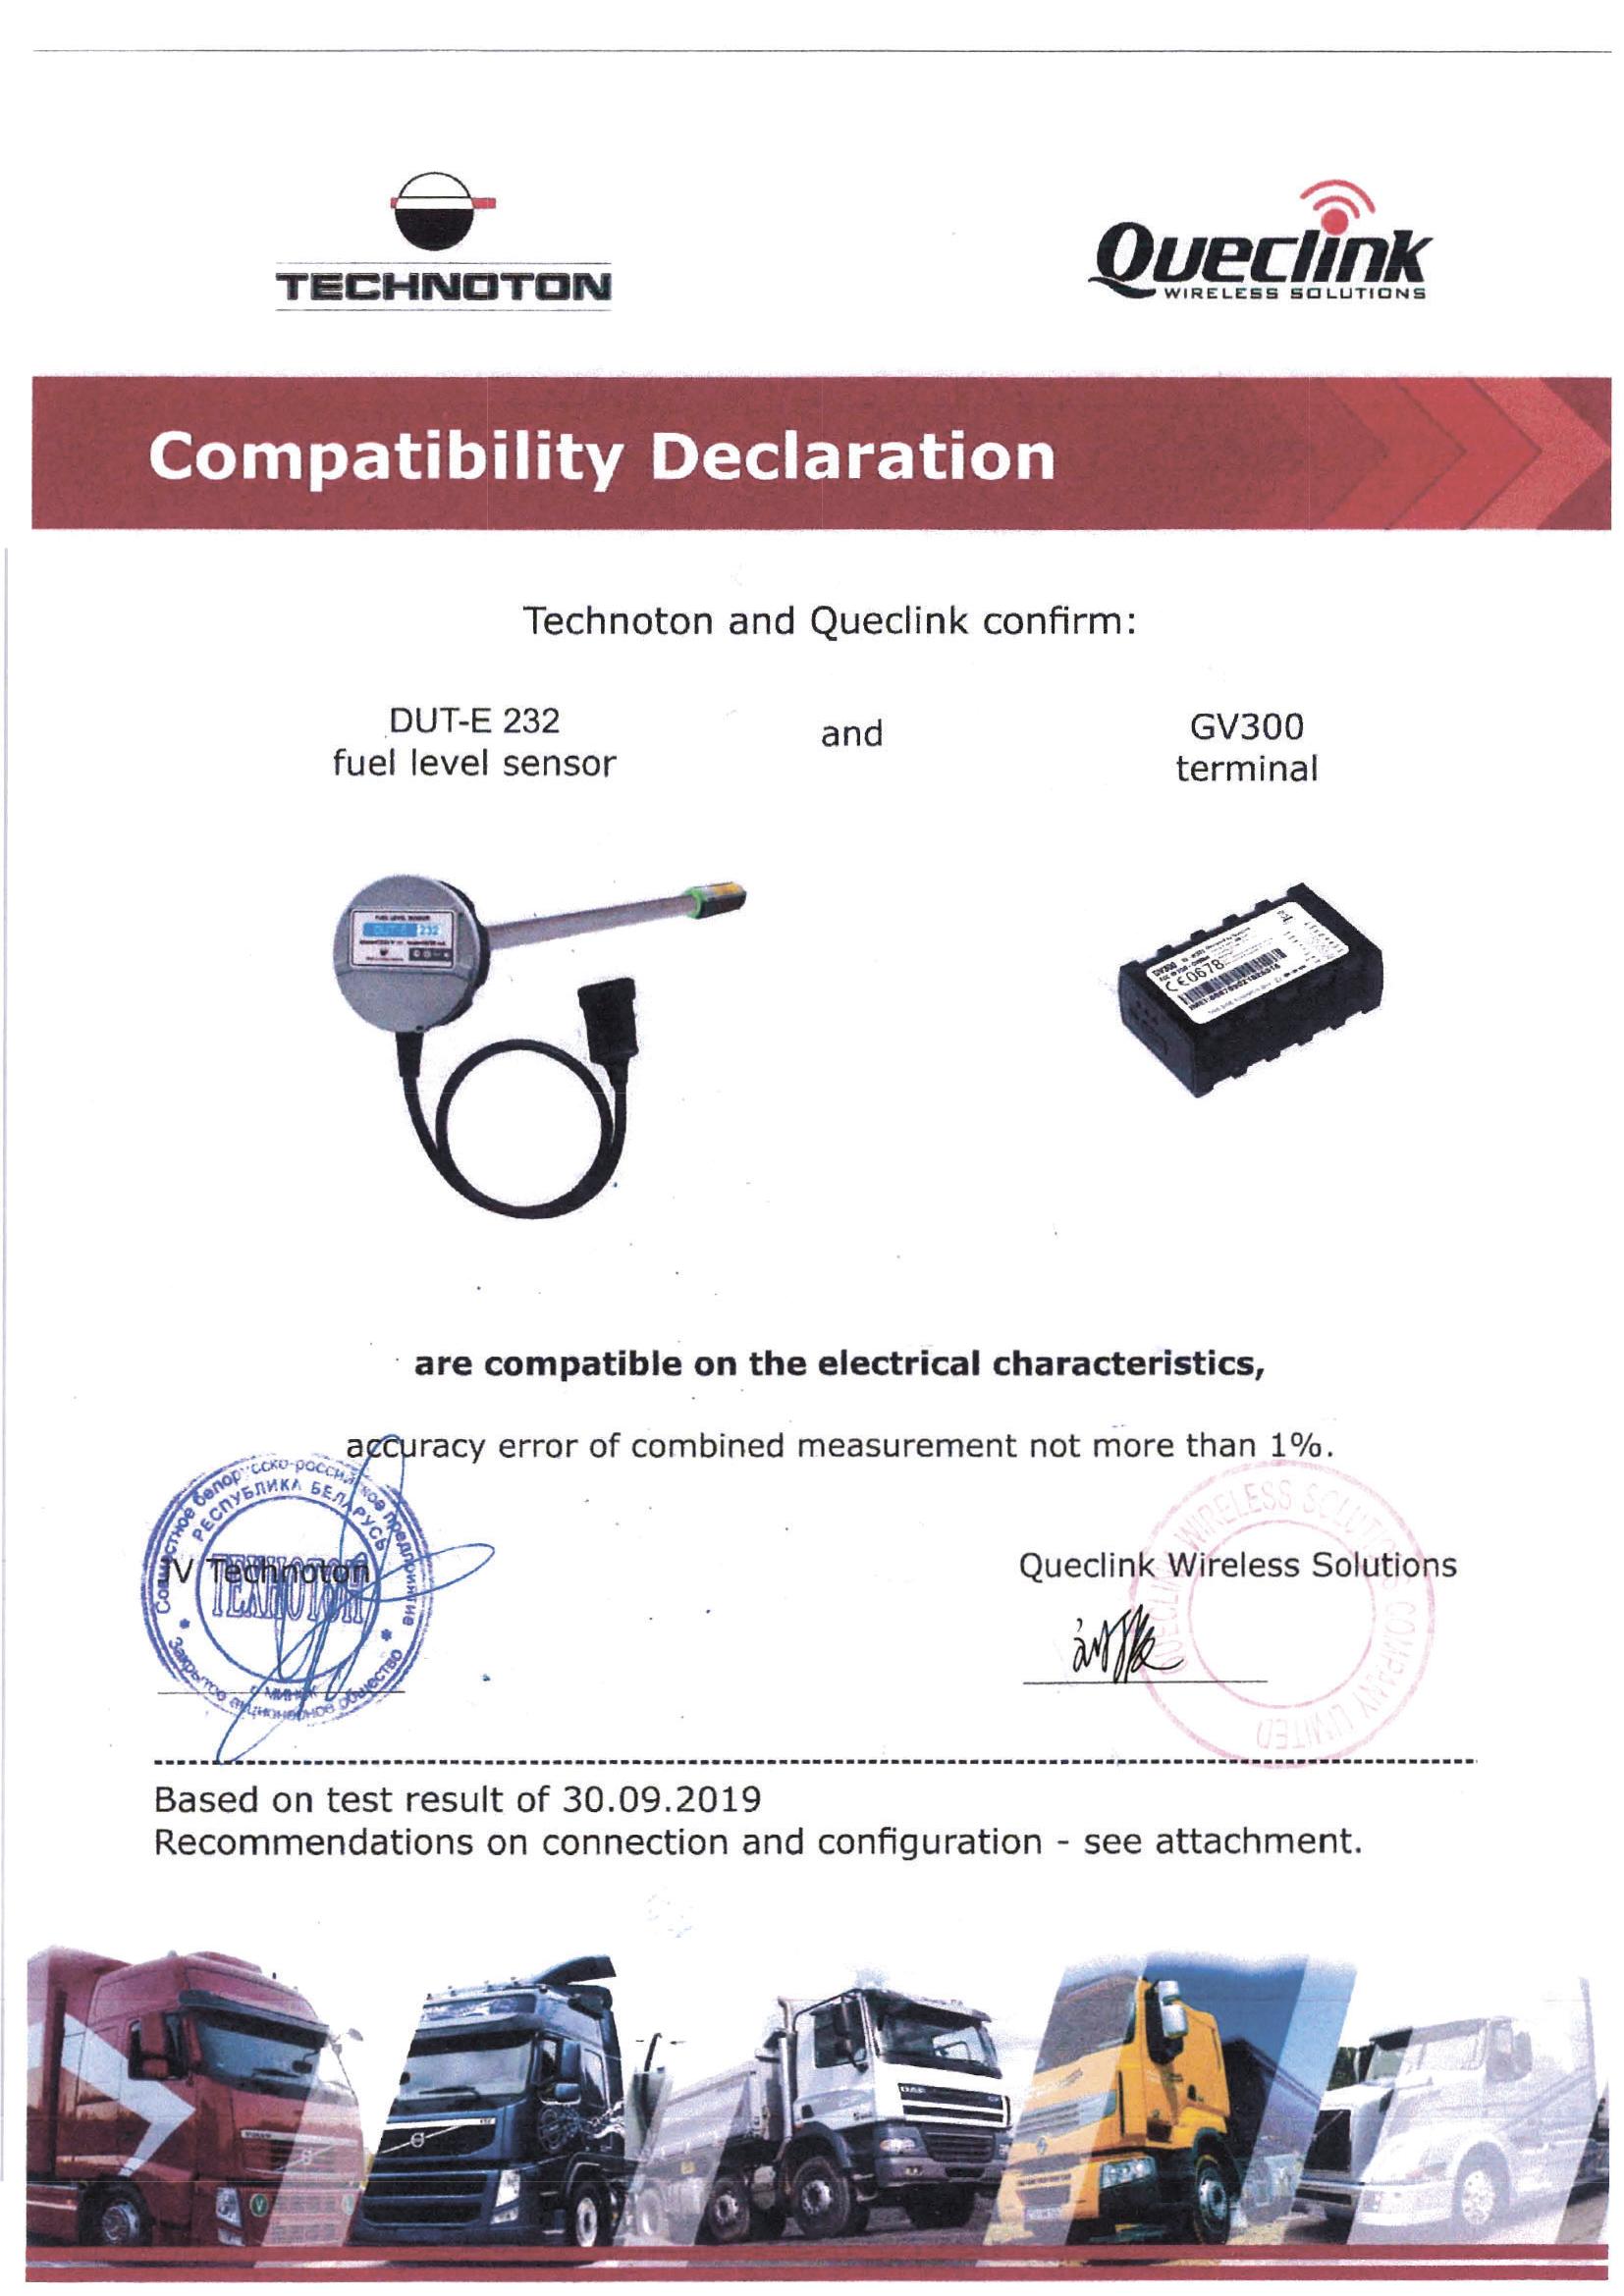 Compatibility Declaration of Technoton DUT-E 232 and Queclink GV300 tracker